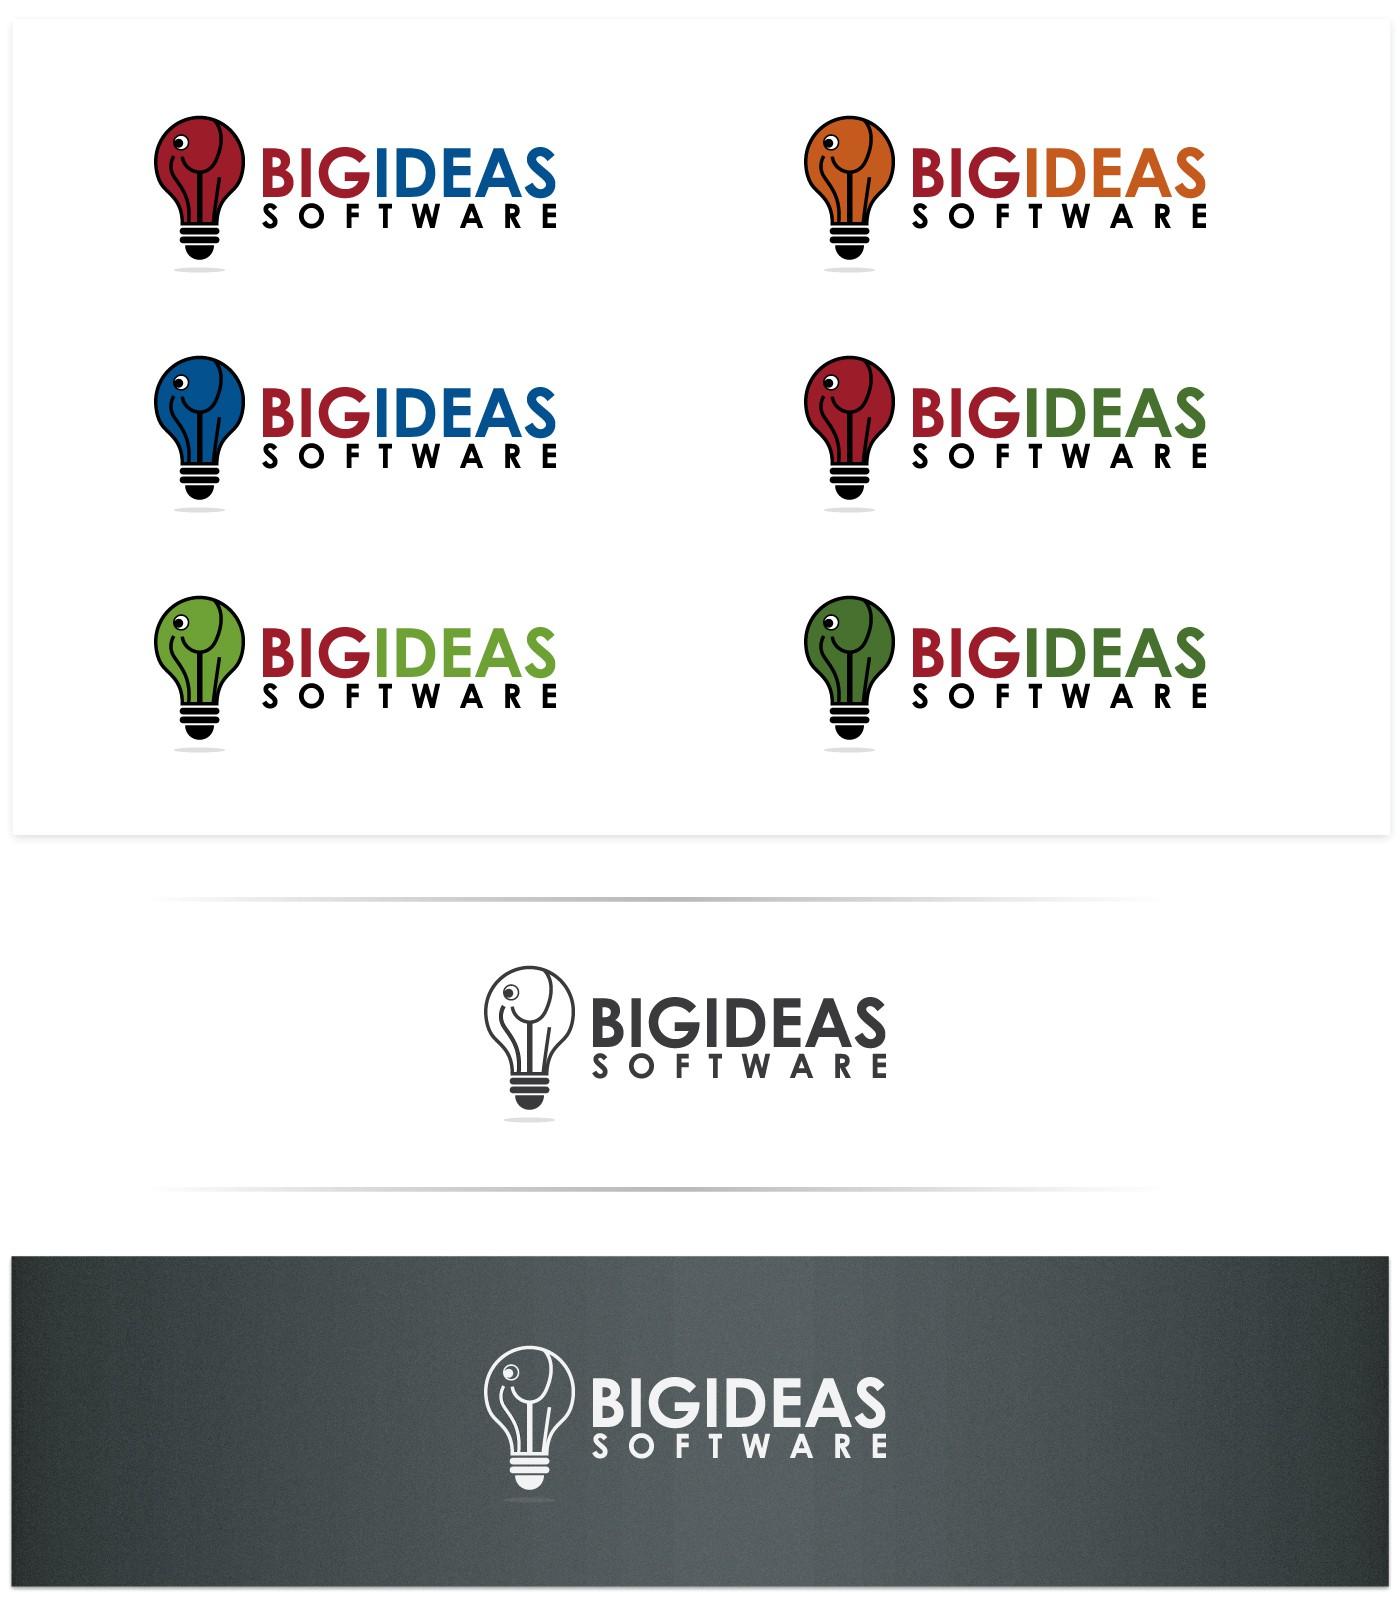 Big Ideas Software needs a new logo